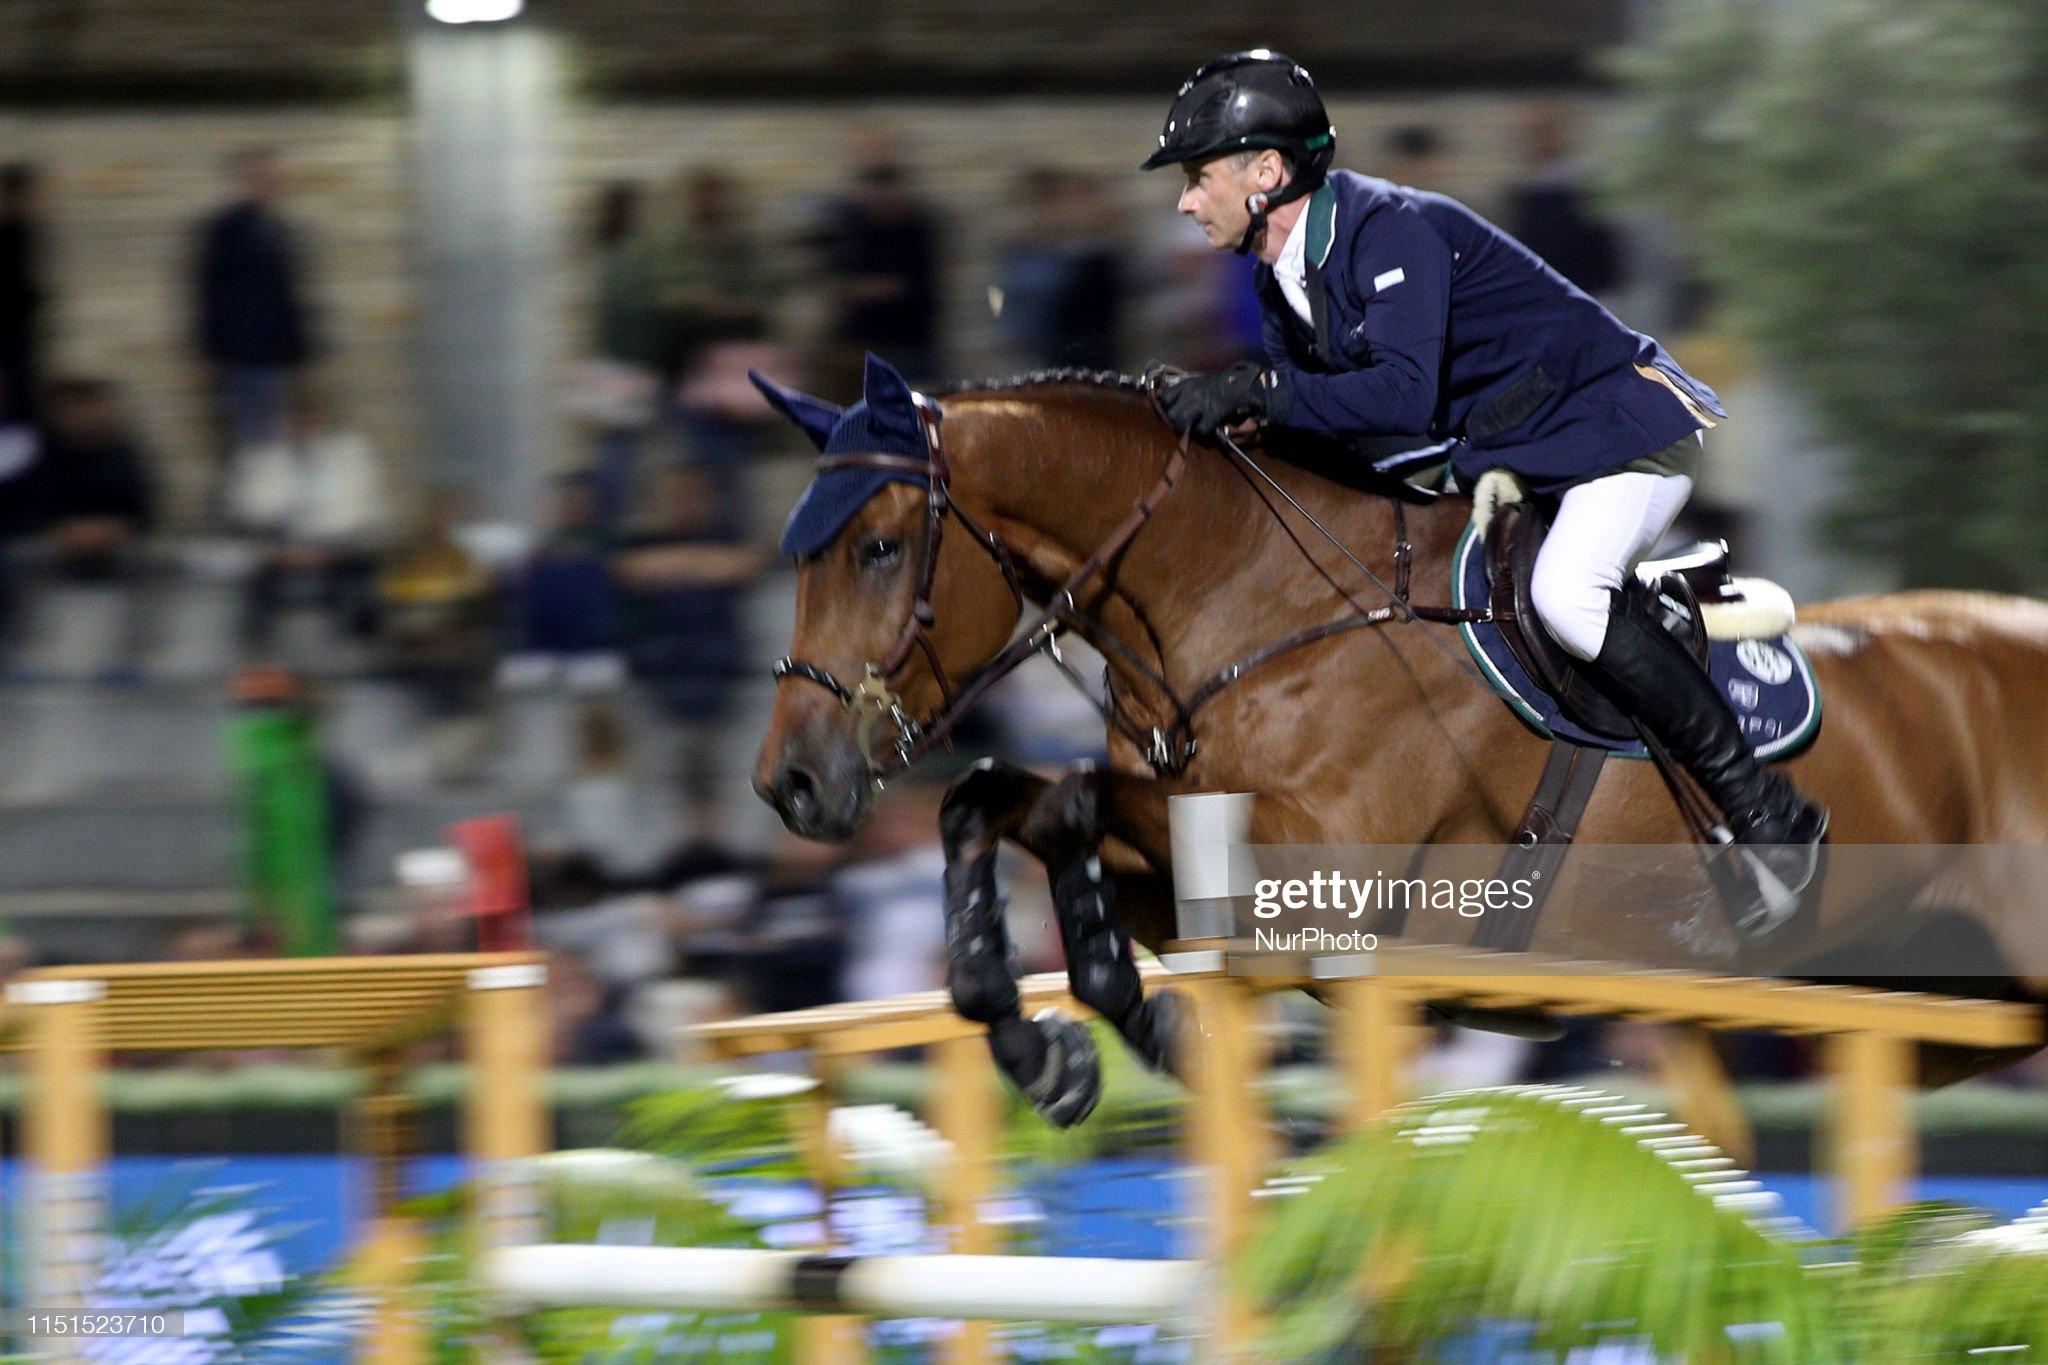 CSI 5* Longines Global Champions Tour Grand Prix of Cascais 2019 : Fotografía de noticias